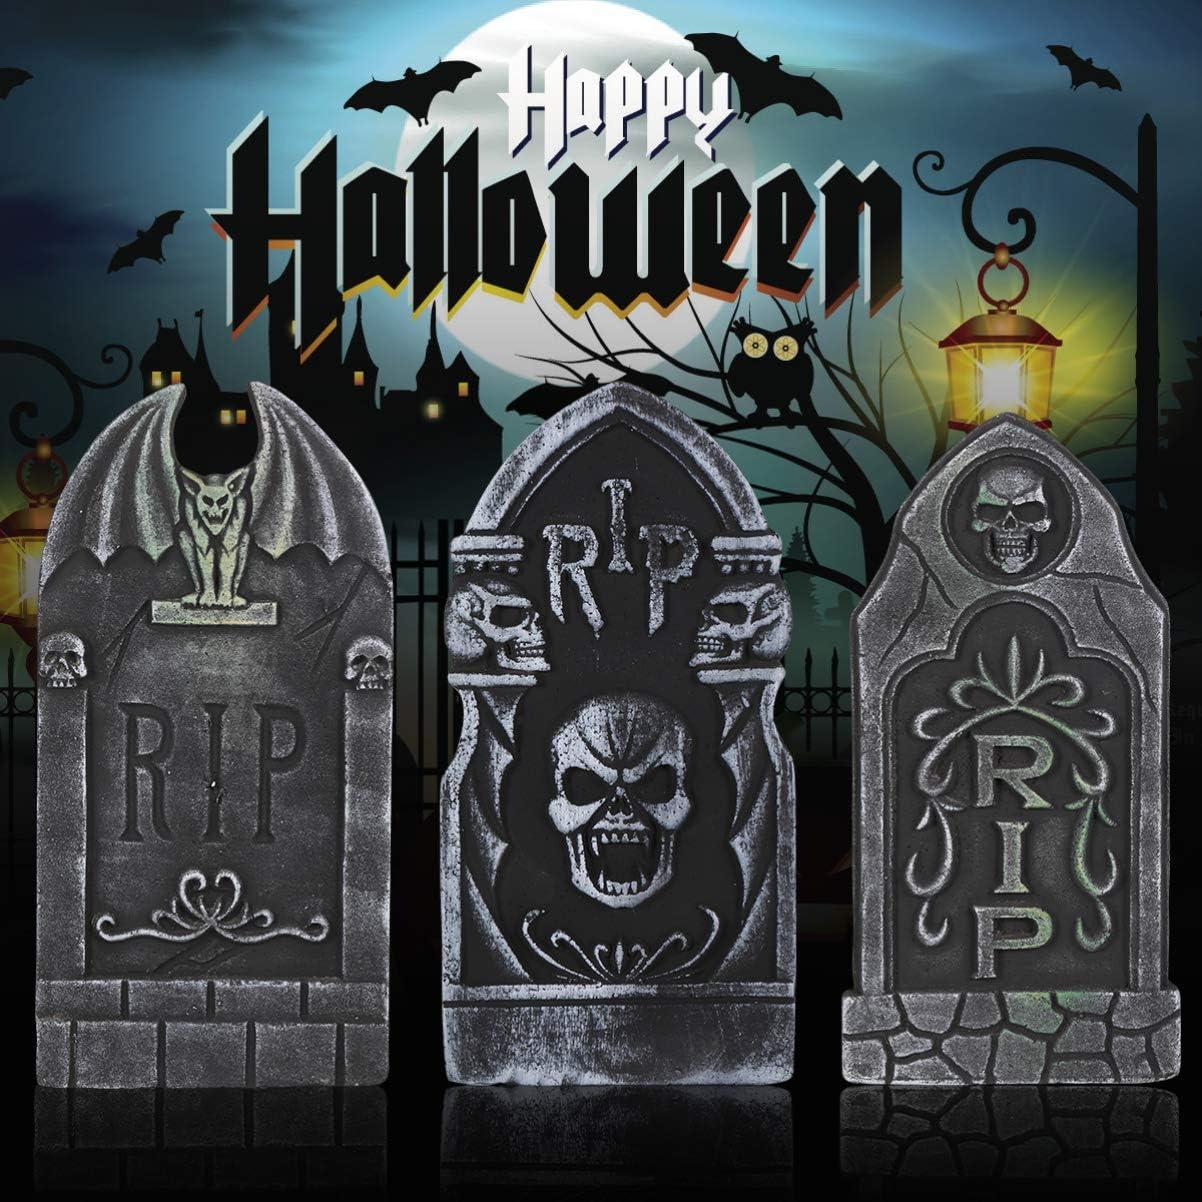 Halloween Foam Tombstones Halloween Yard Decorations Lawn Headstones Spooky Haunted House Decorations 5PCS